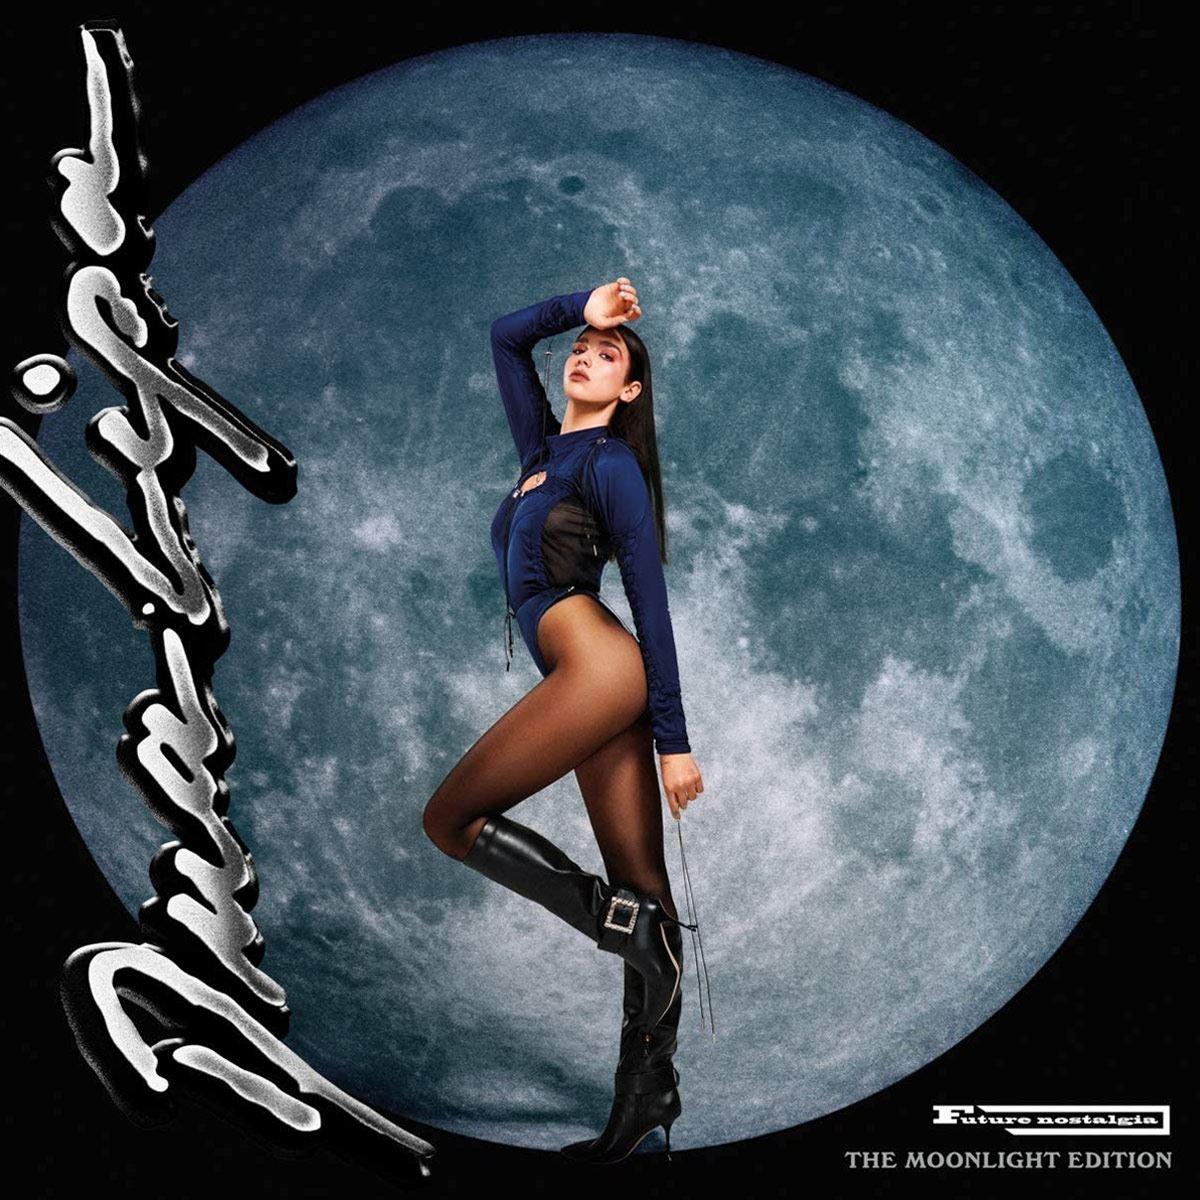 CD Dua Lipa - Future Nostalgia Moonlight Edition